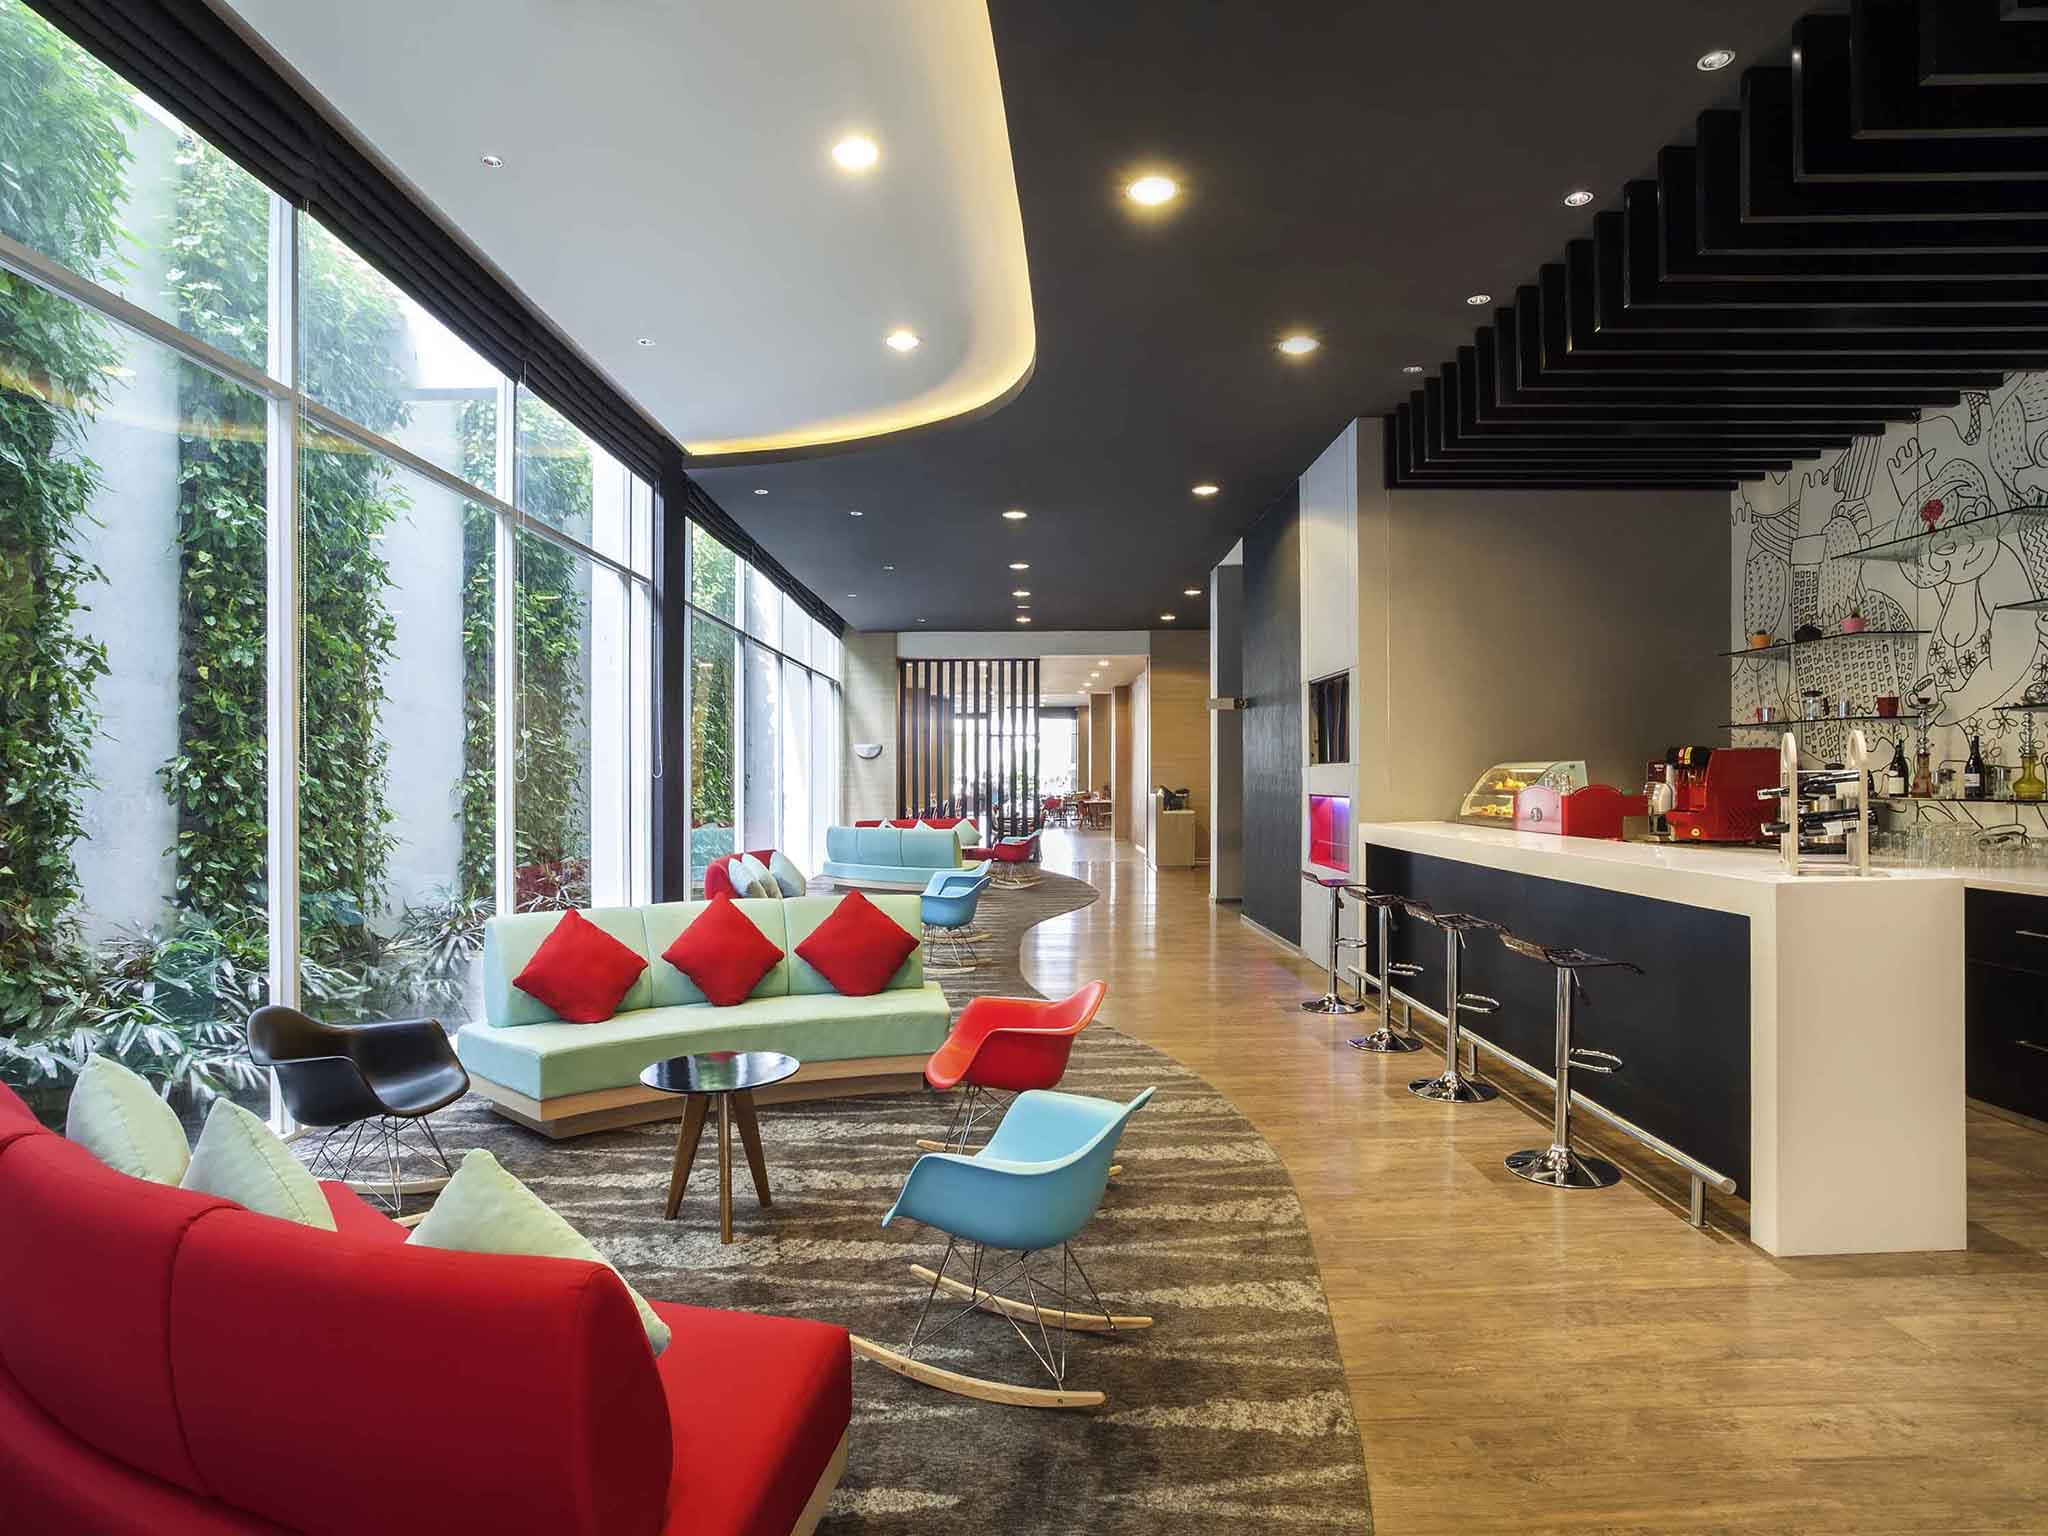 Hotel Jakarta Ibis Harmoni Bar Alive Museum Ancol Kota Administrasi